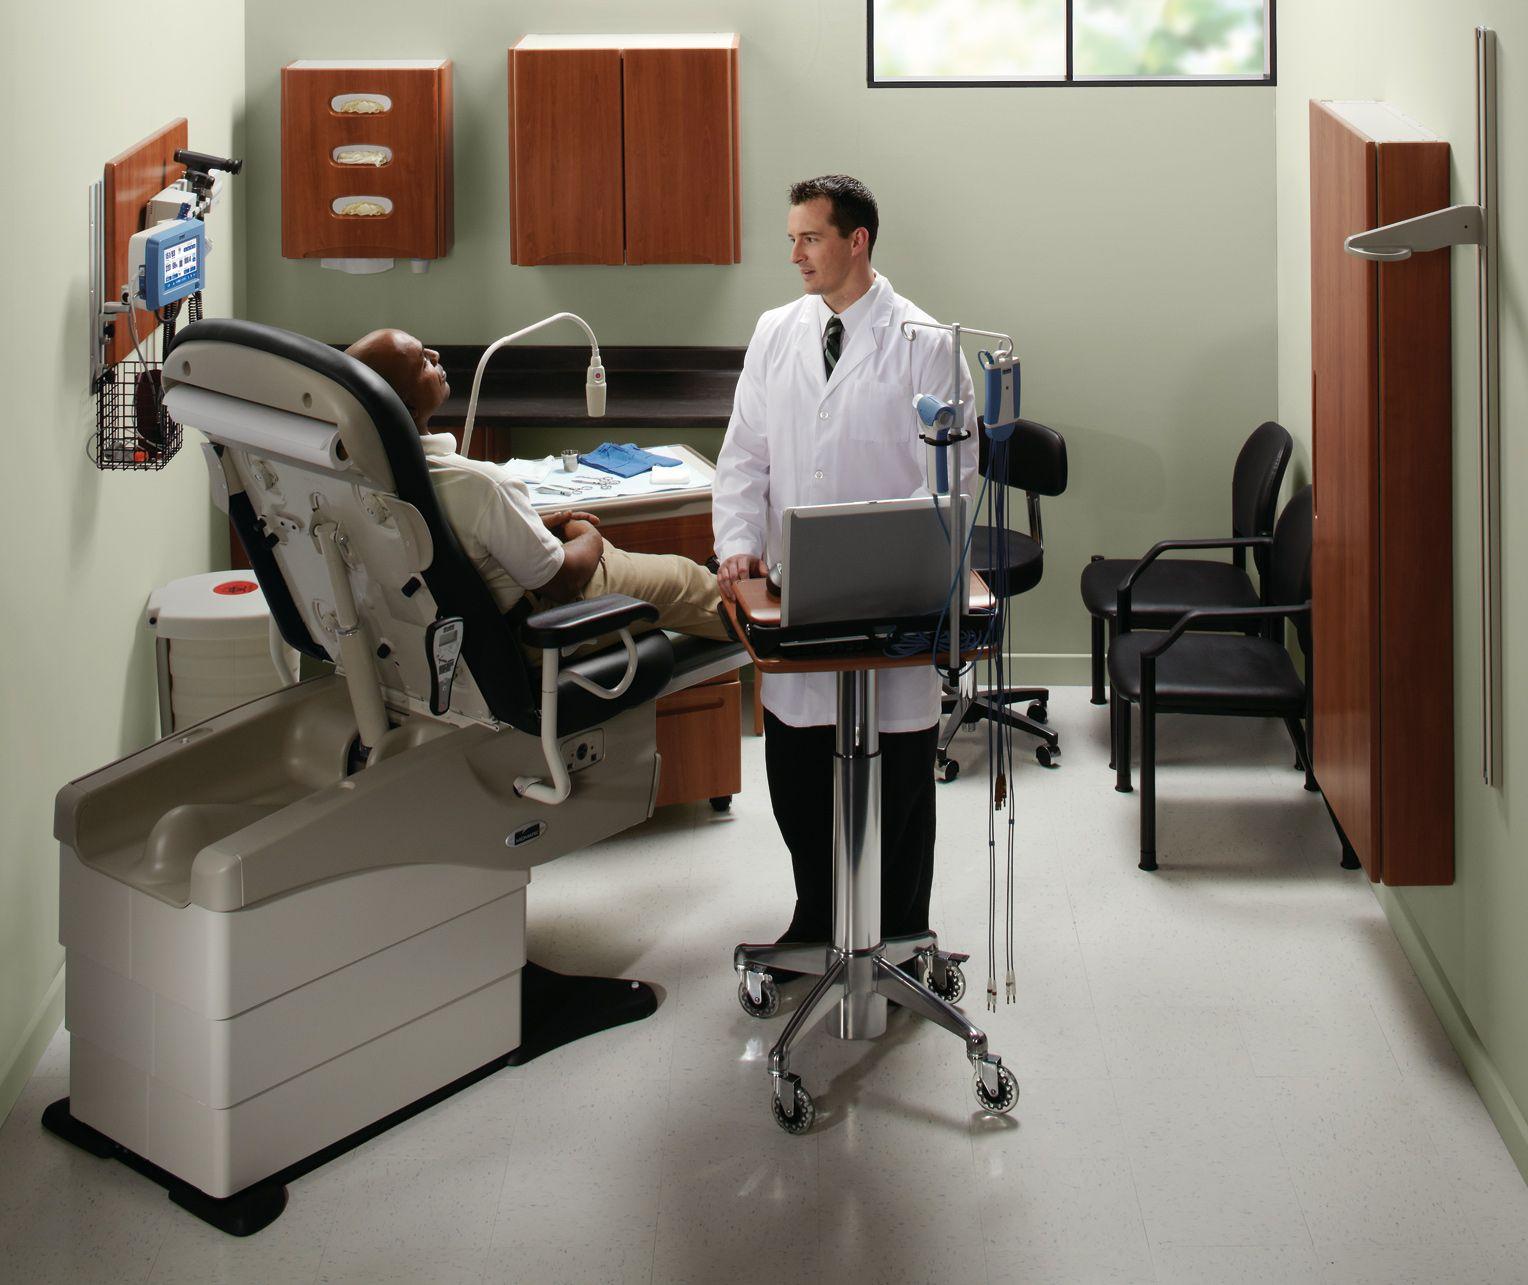 Dedicated Zones Workflow Medical office design, Workflow